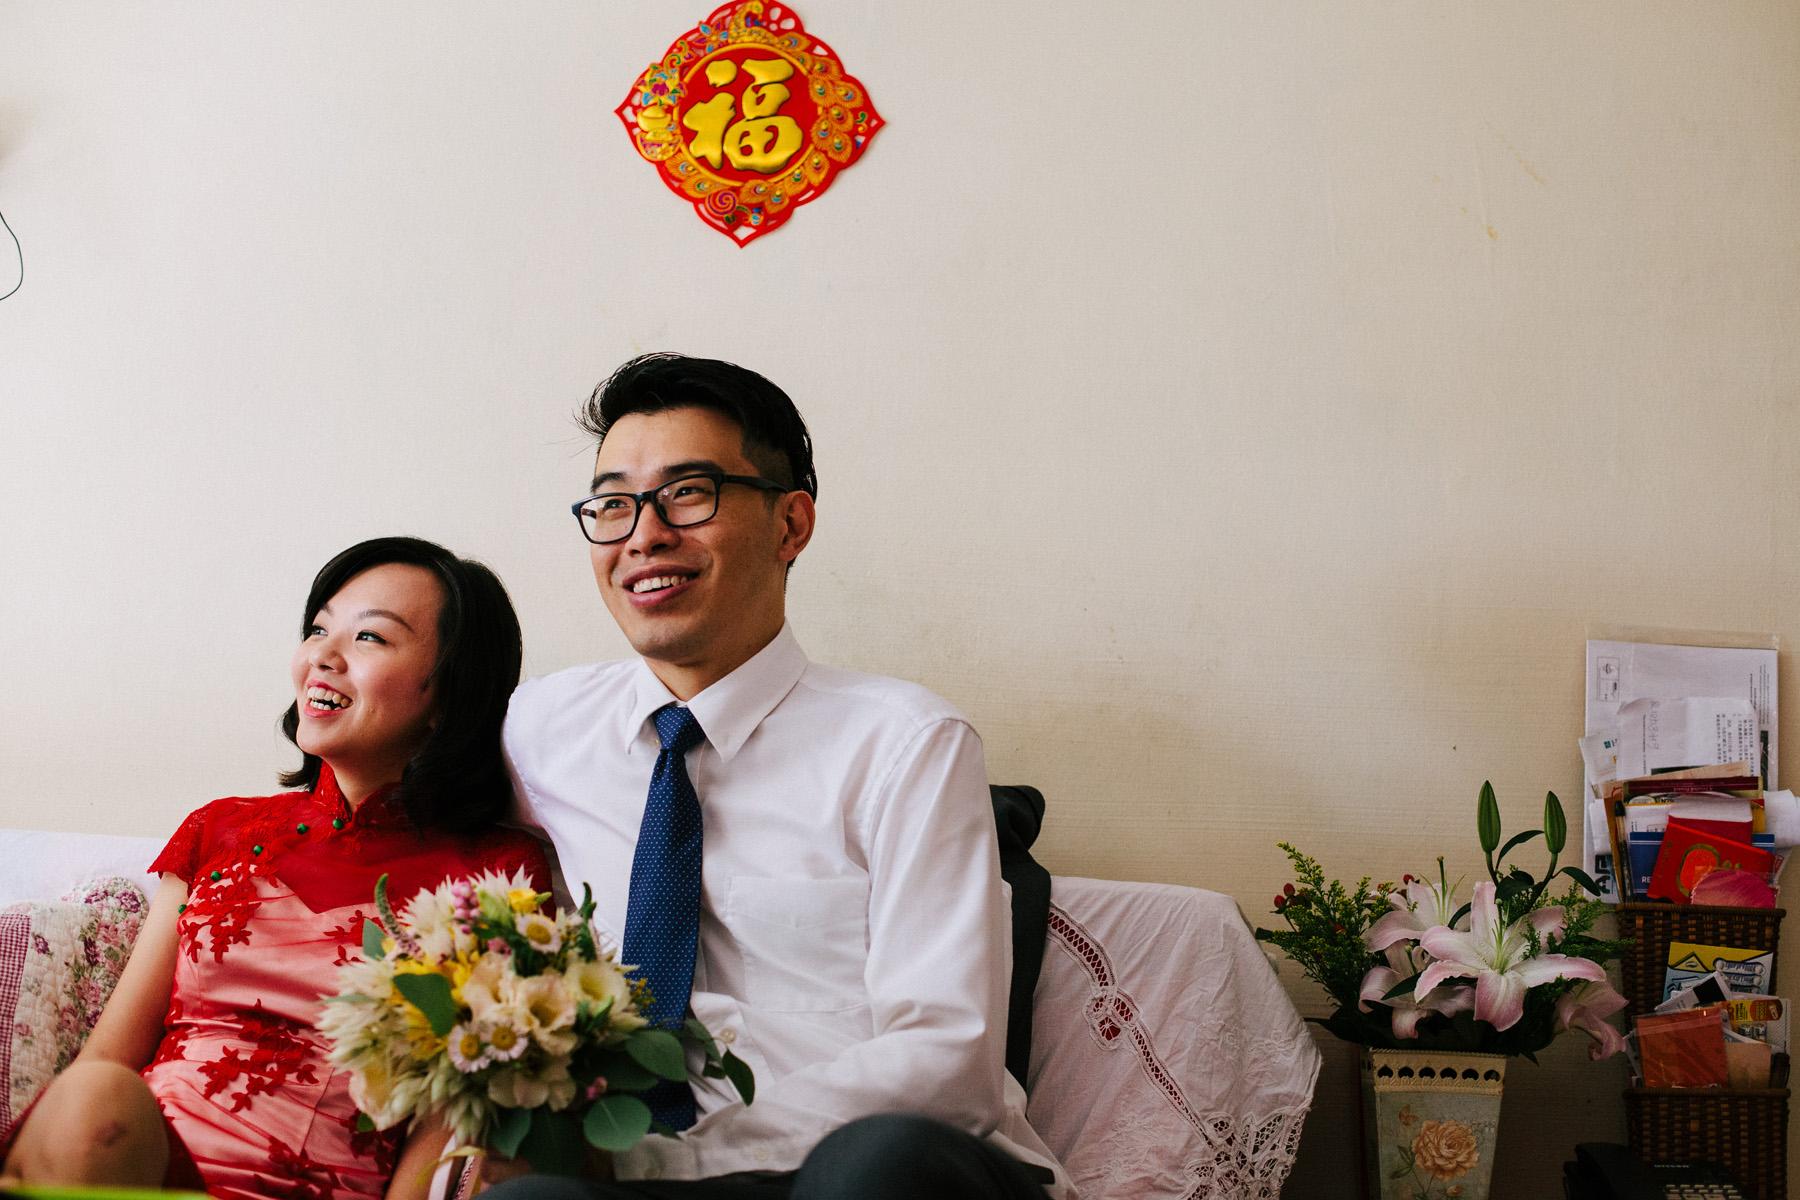 singapore-wedding-travel-photographer-faith-alvin-wedding-wmt-17.jpg